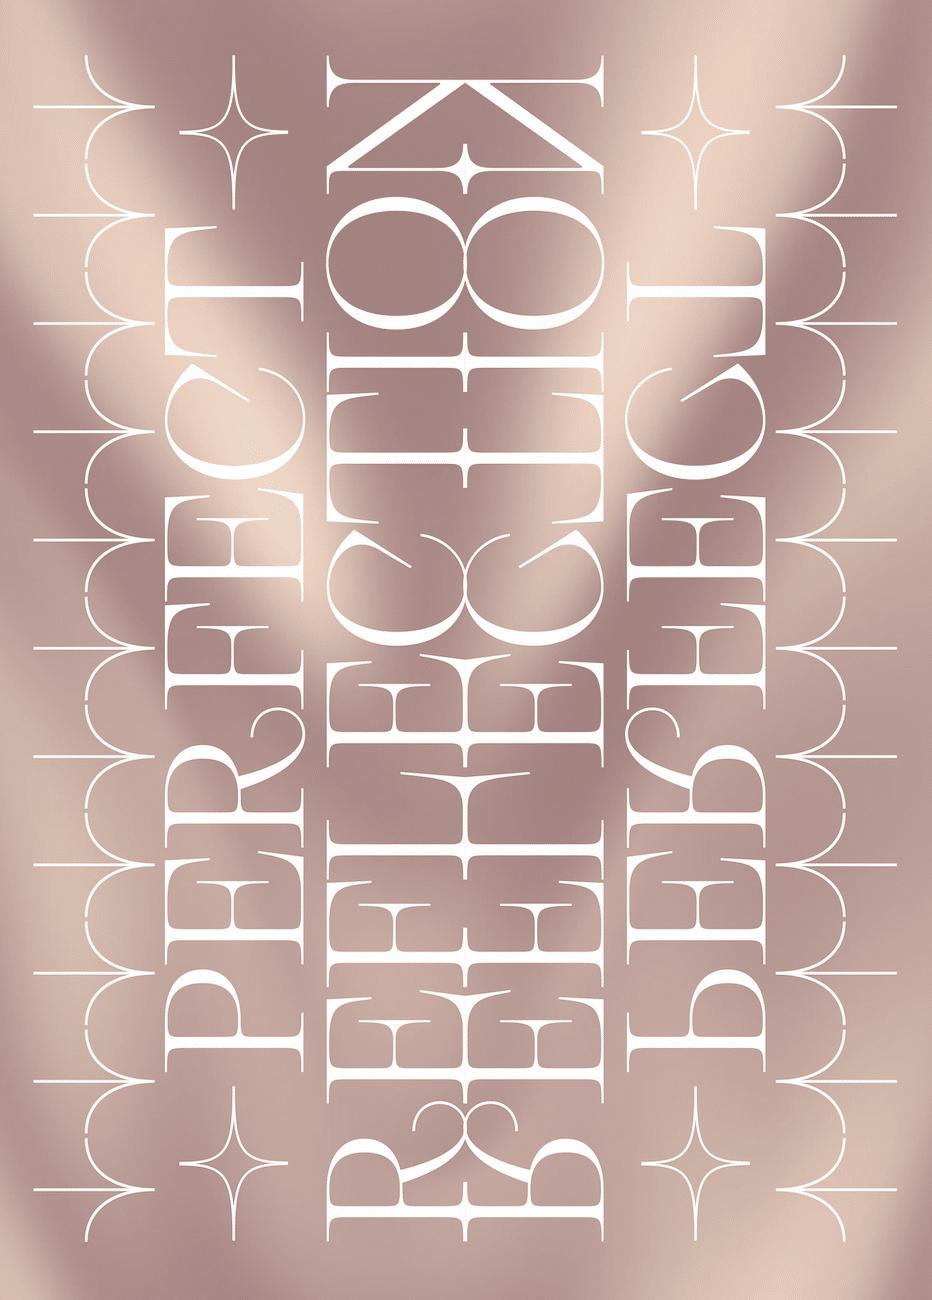 Typo-Buch-Tipp New Aesthetic mit Emma Marichal